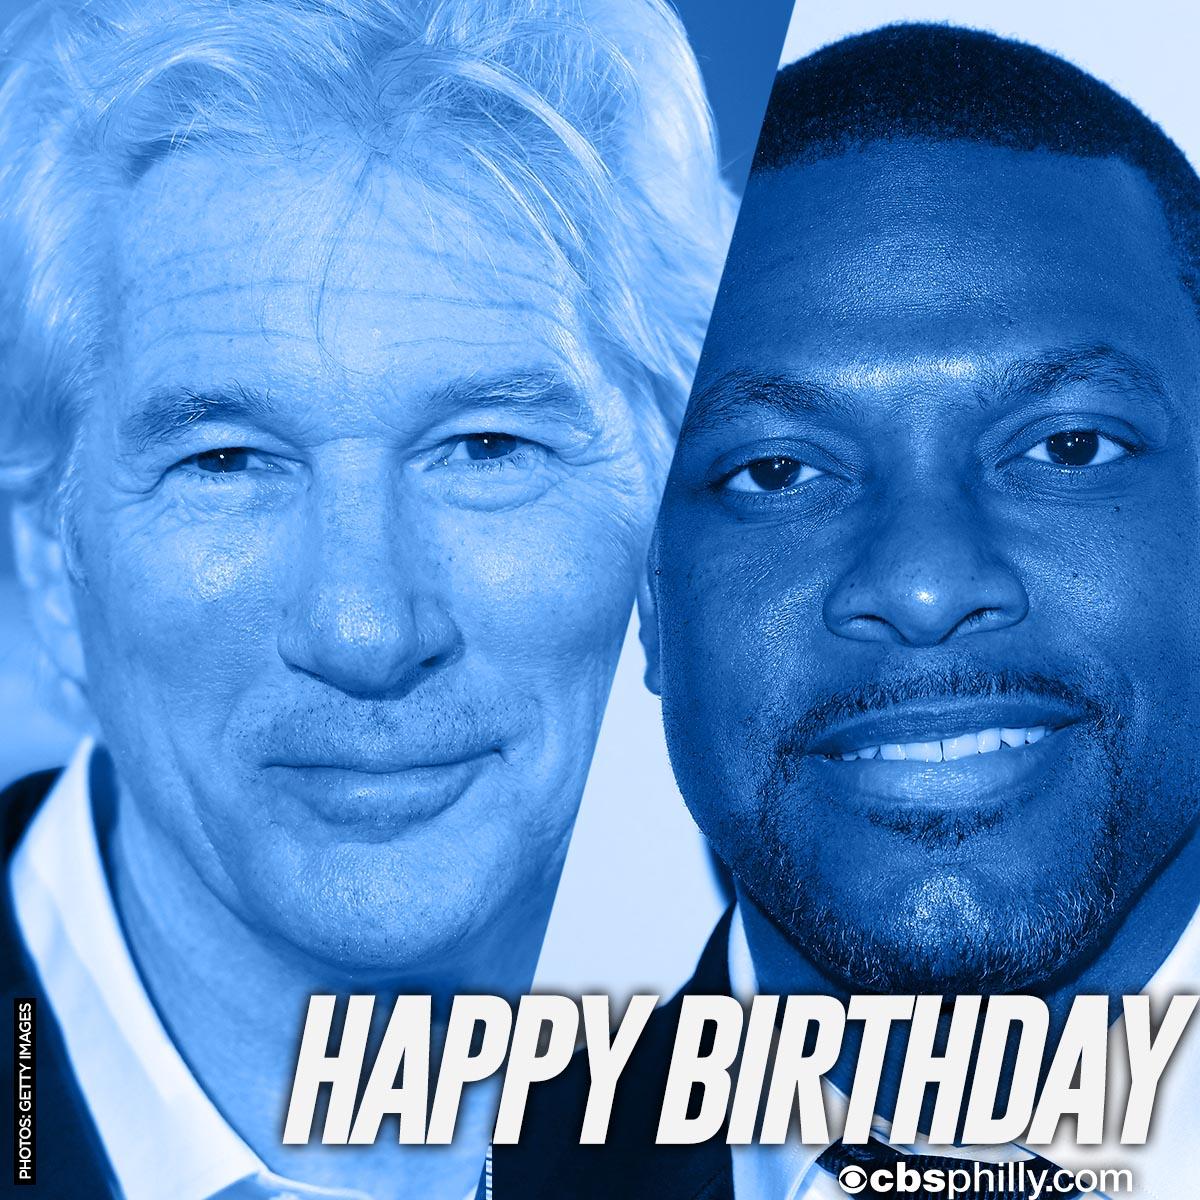 HAPPY BIRTHDAY Richard Gere & Chris Tucker!